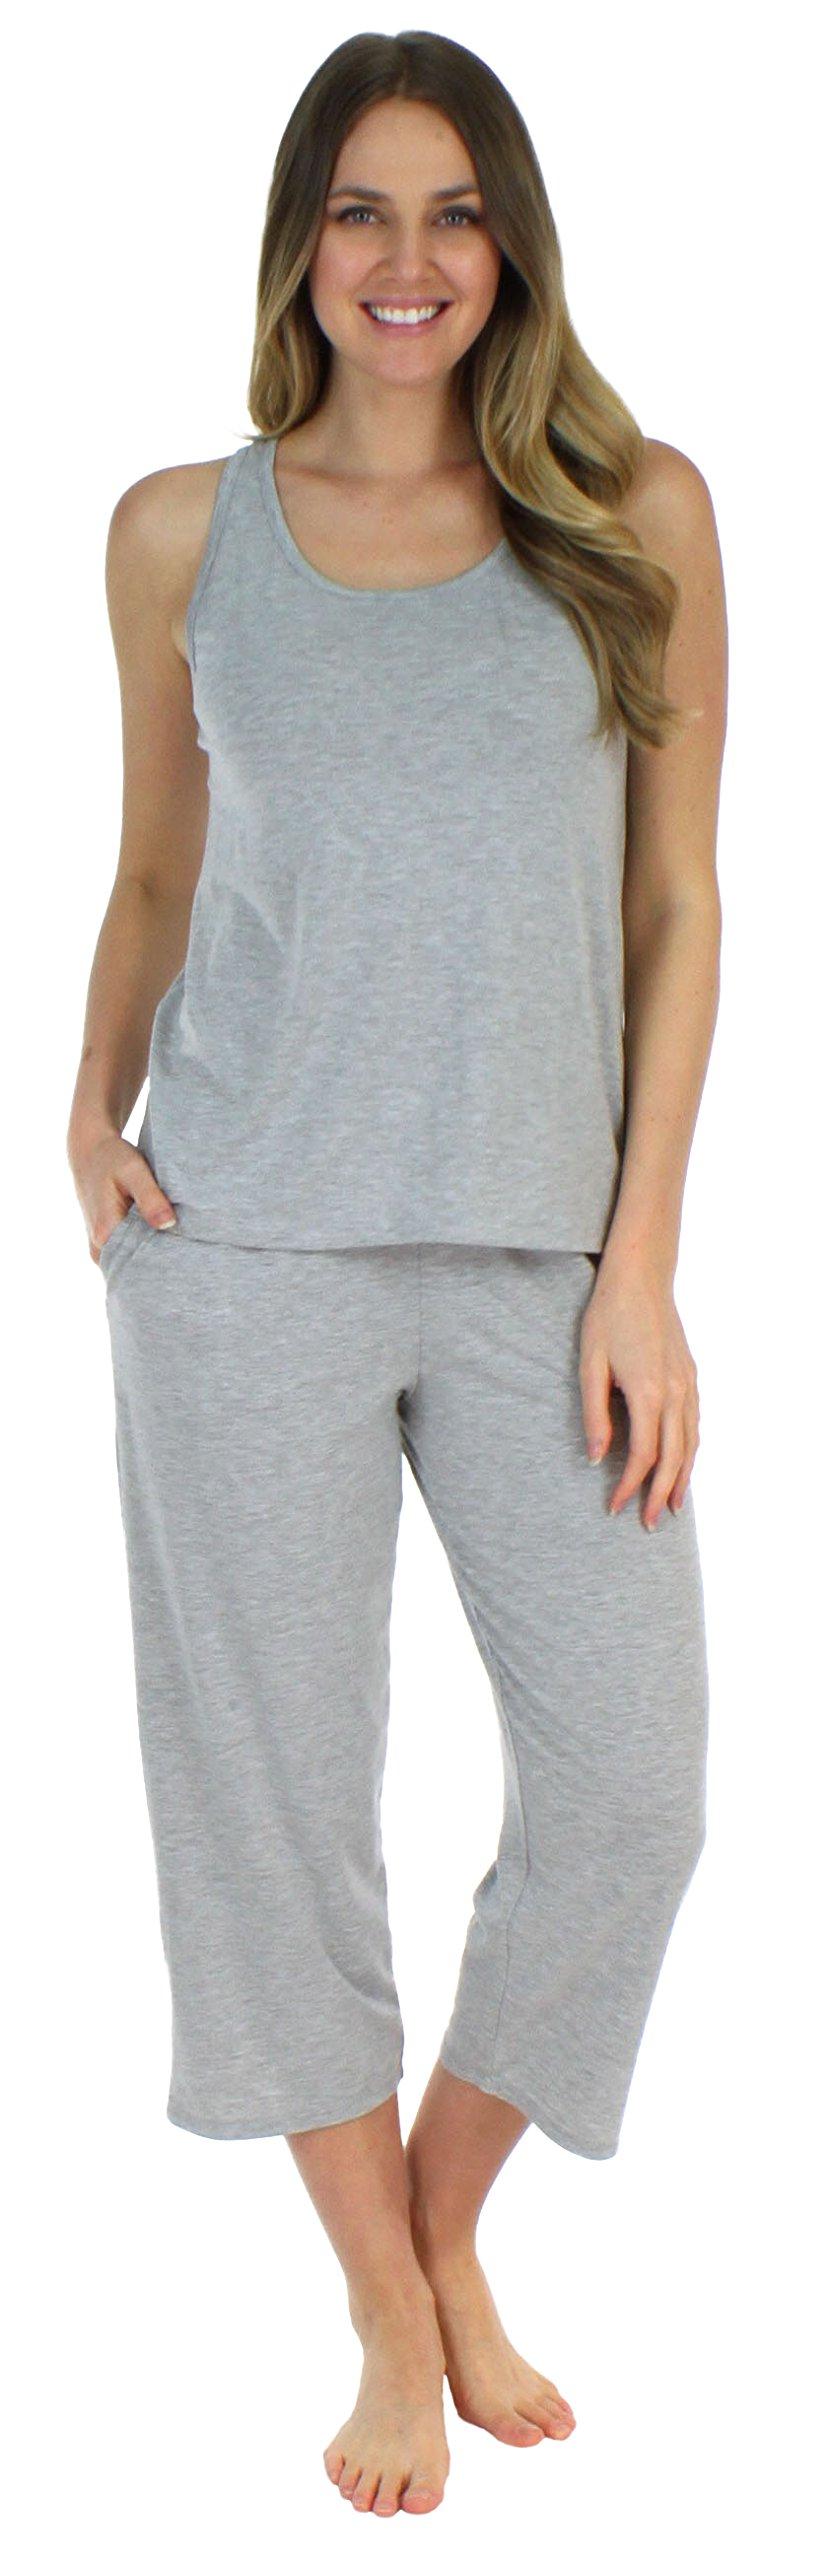 Sleepyheads Women's Sleepwear Jersey Lightweight Tank Top and Capri Pajama Set (SH1832-2027-MED)